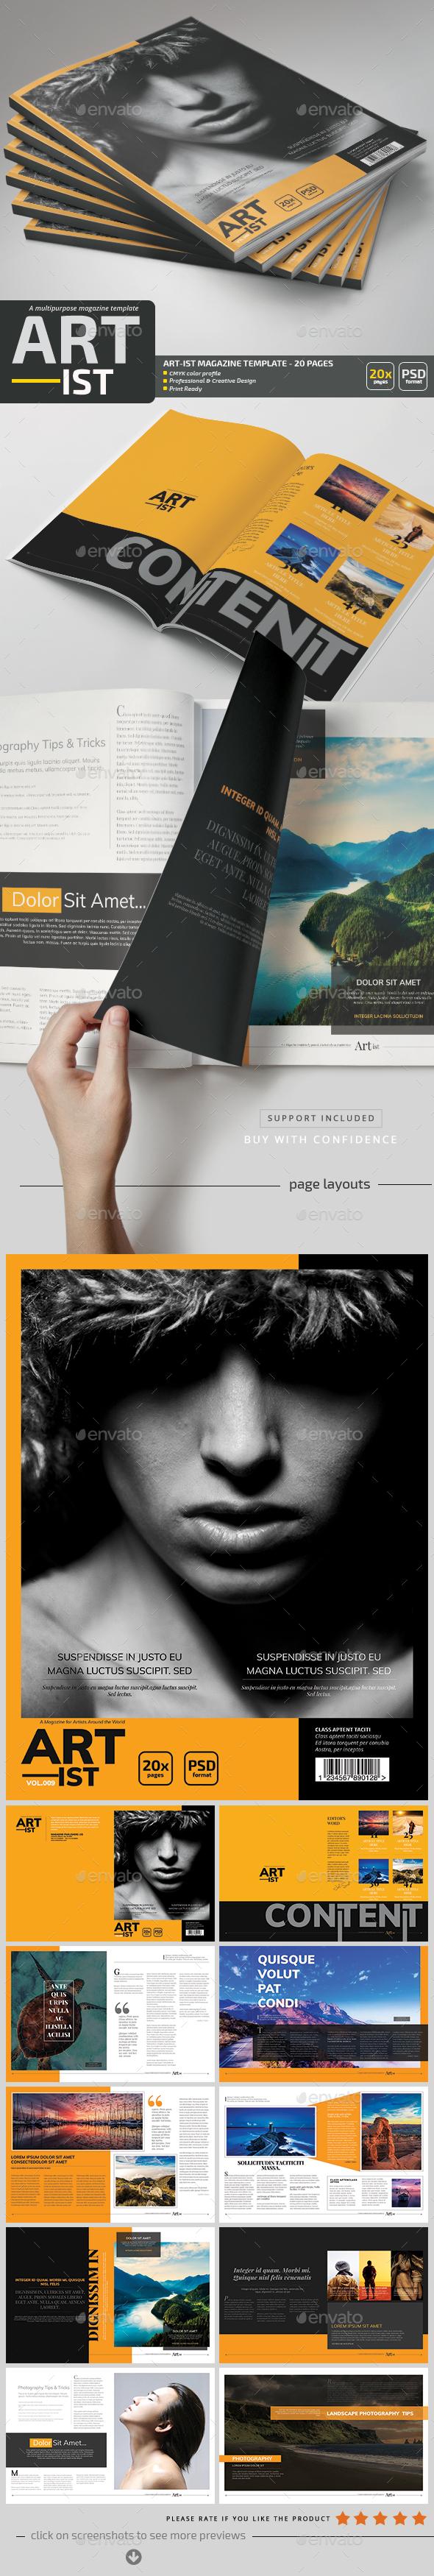 Art-ist Magazine Template V.9 - Magazines Print Templates